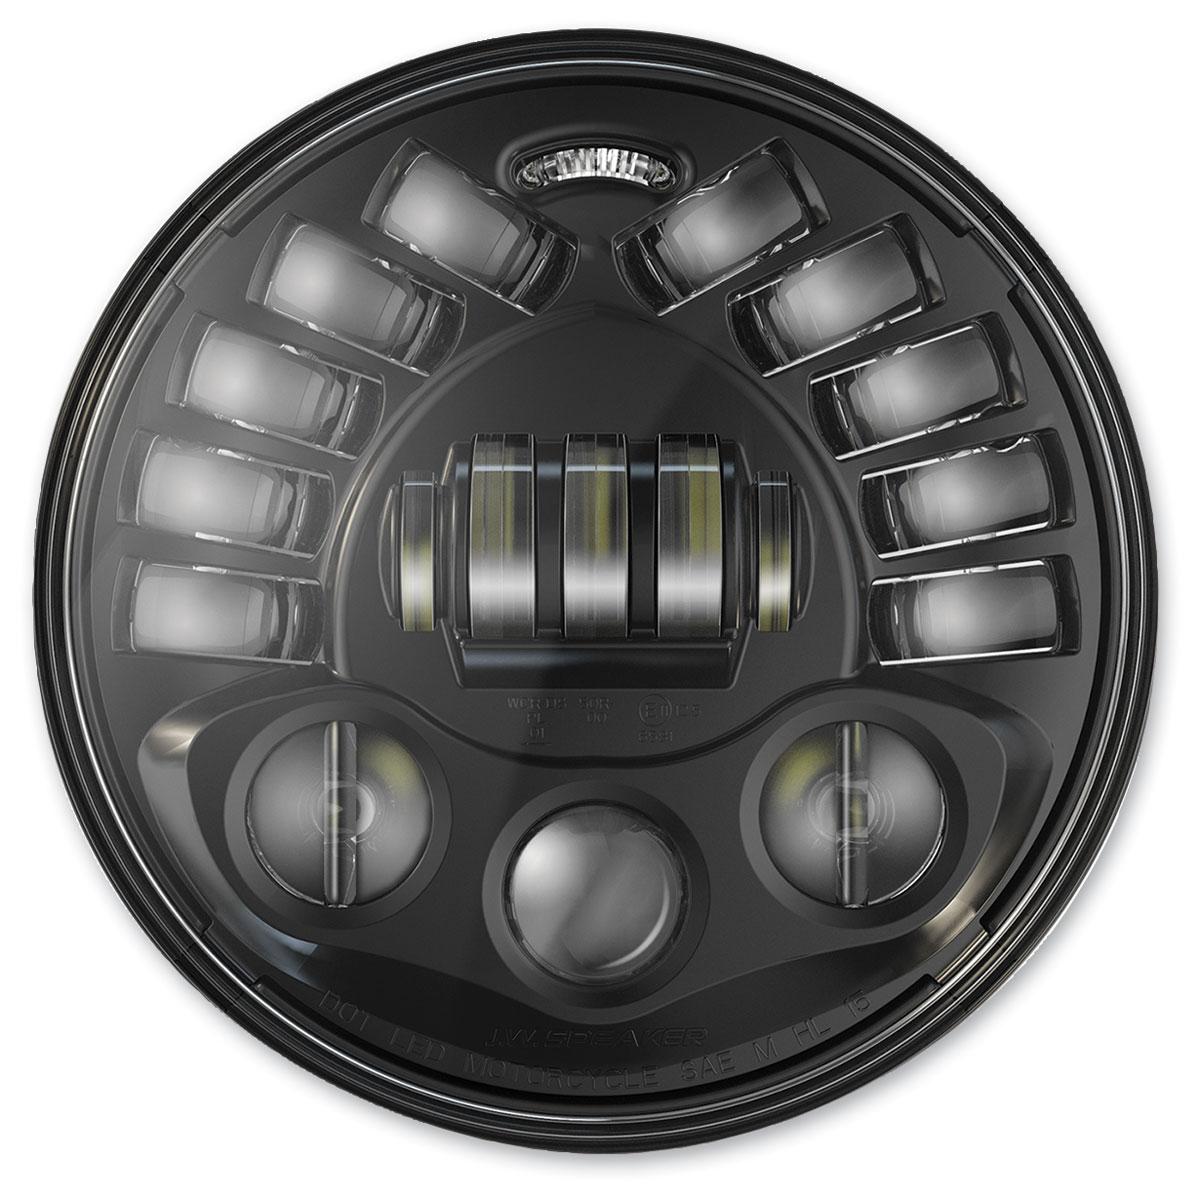 J.W. Speaker 7″ Pedestal Mount LED Adaptive Headlight Black